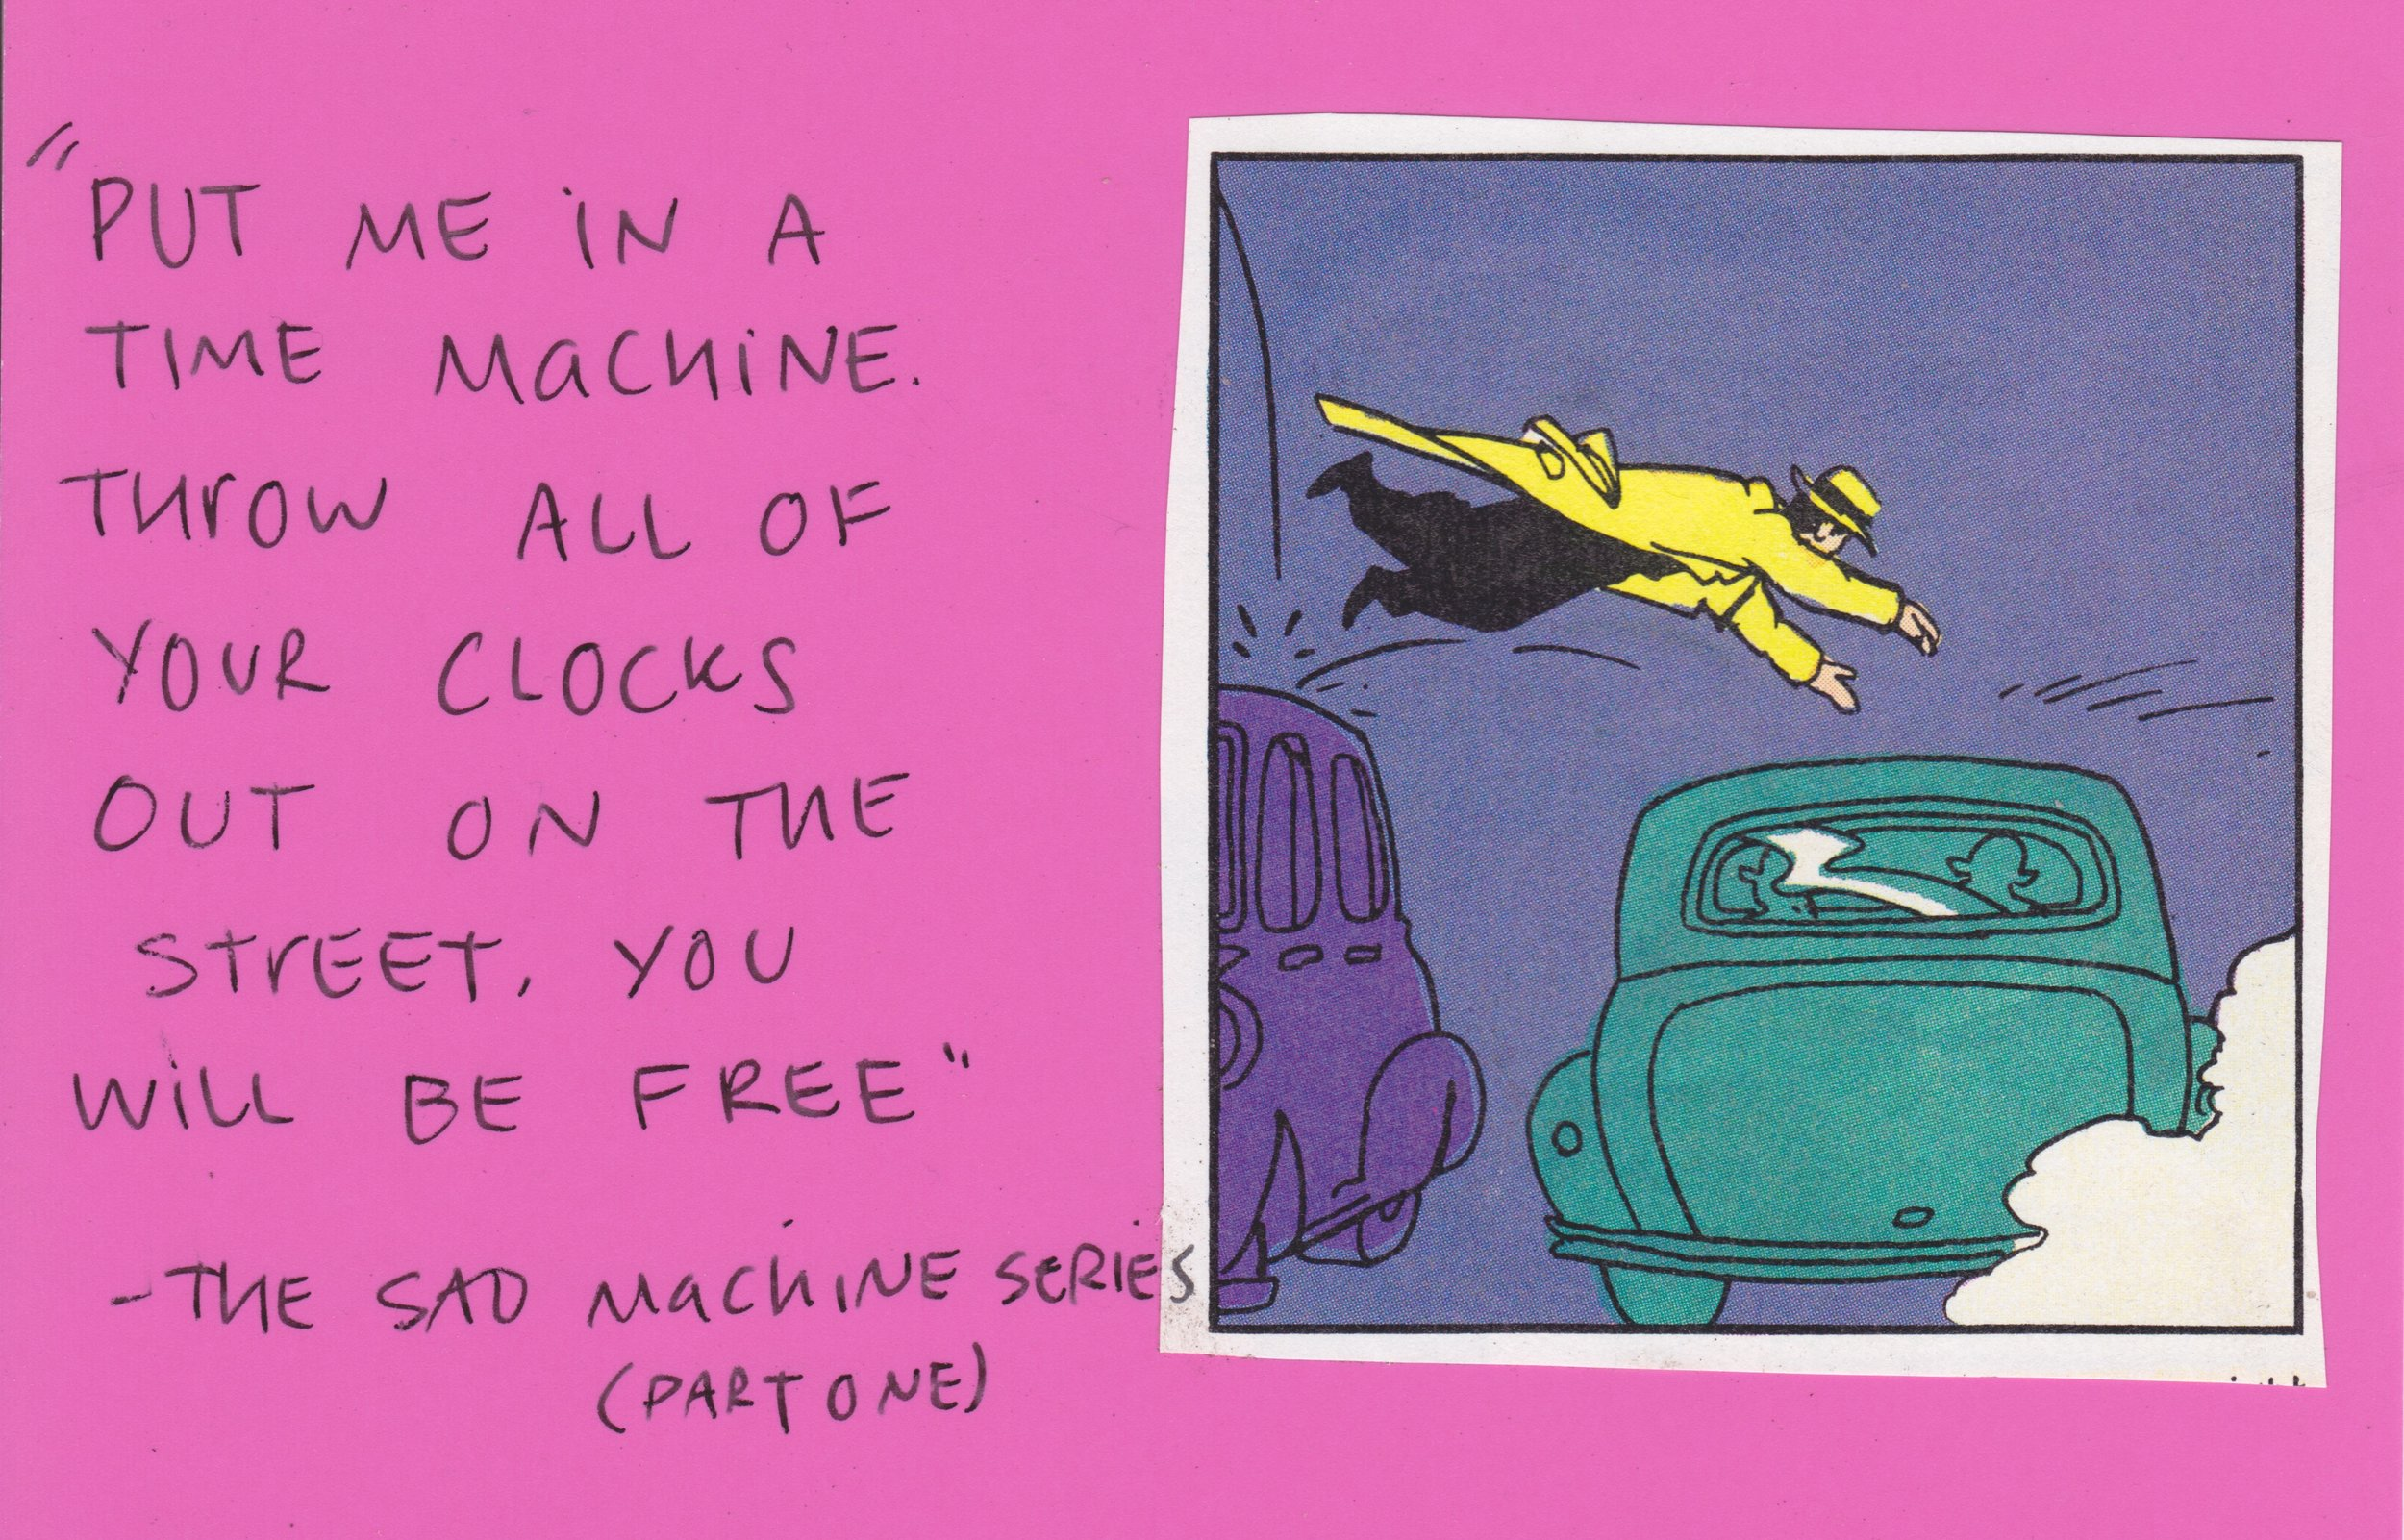 Sad Machine Series Quotes 7.jpeg